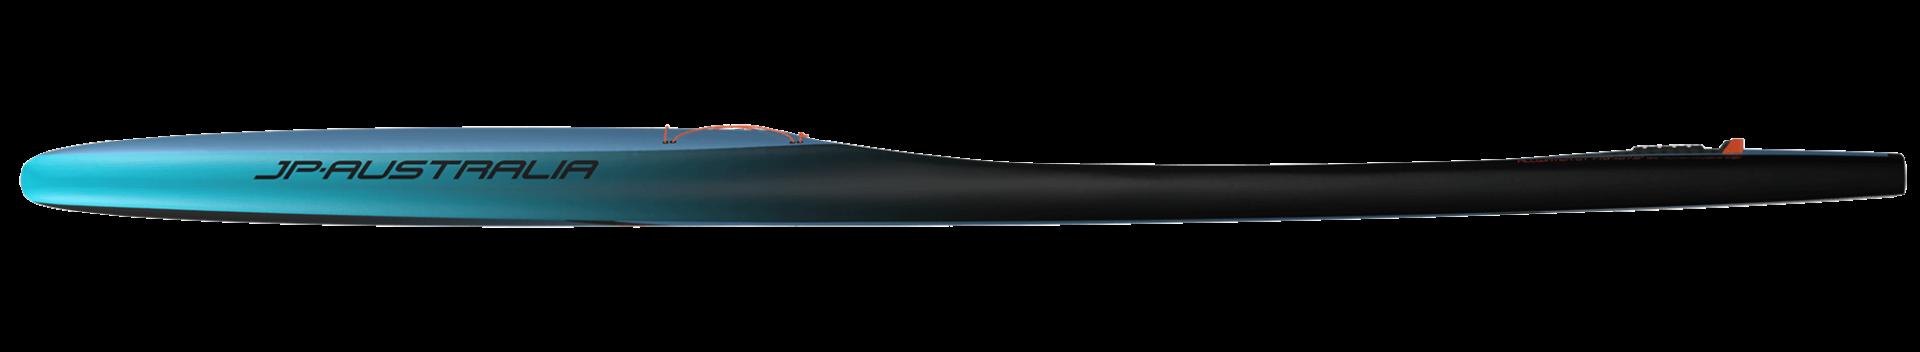 JP Australia SUP Composite Allwater GT